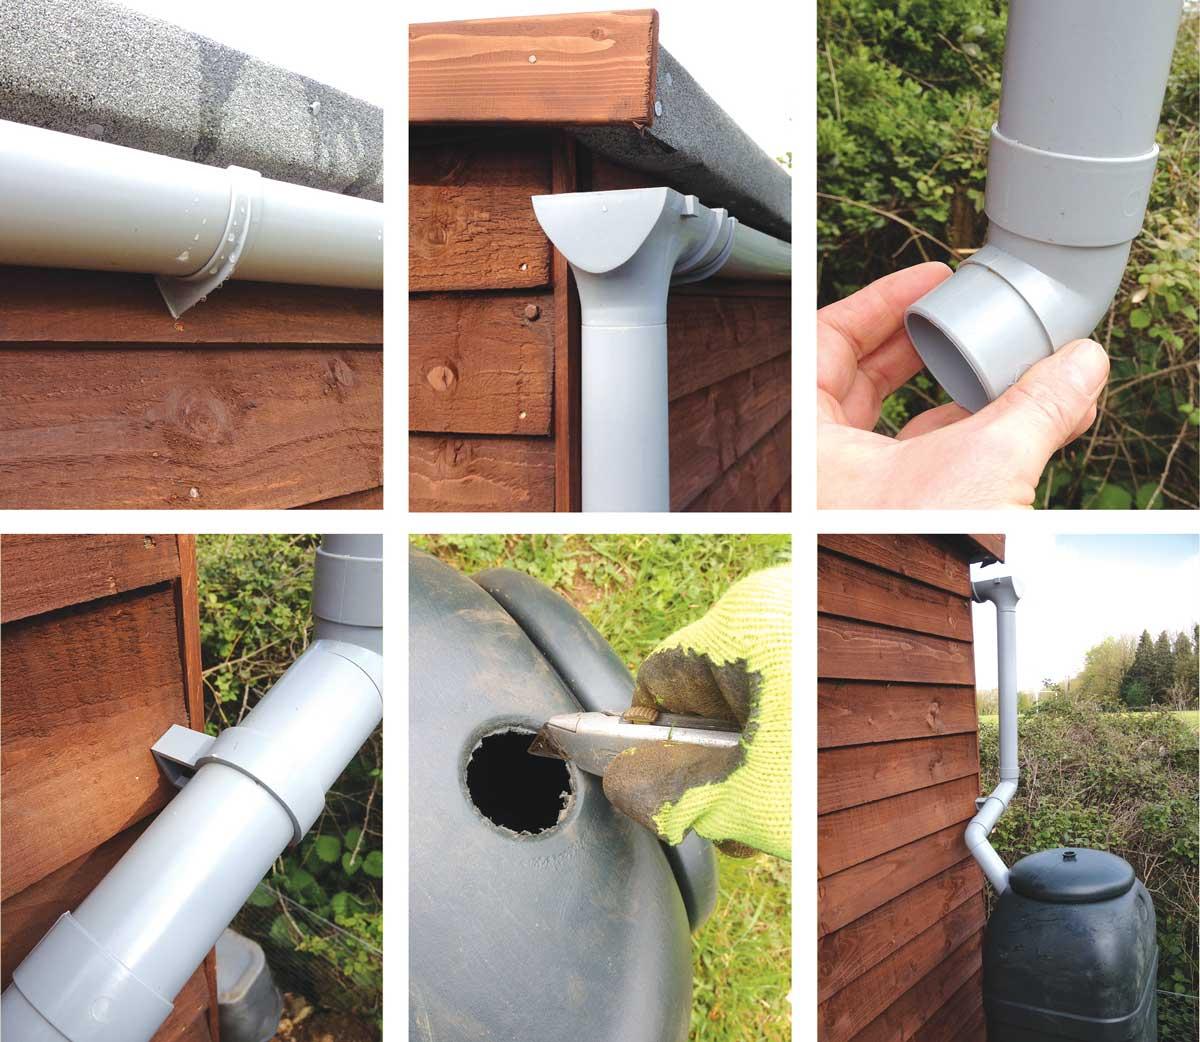 Sistem za sakupljanje kišnice